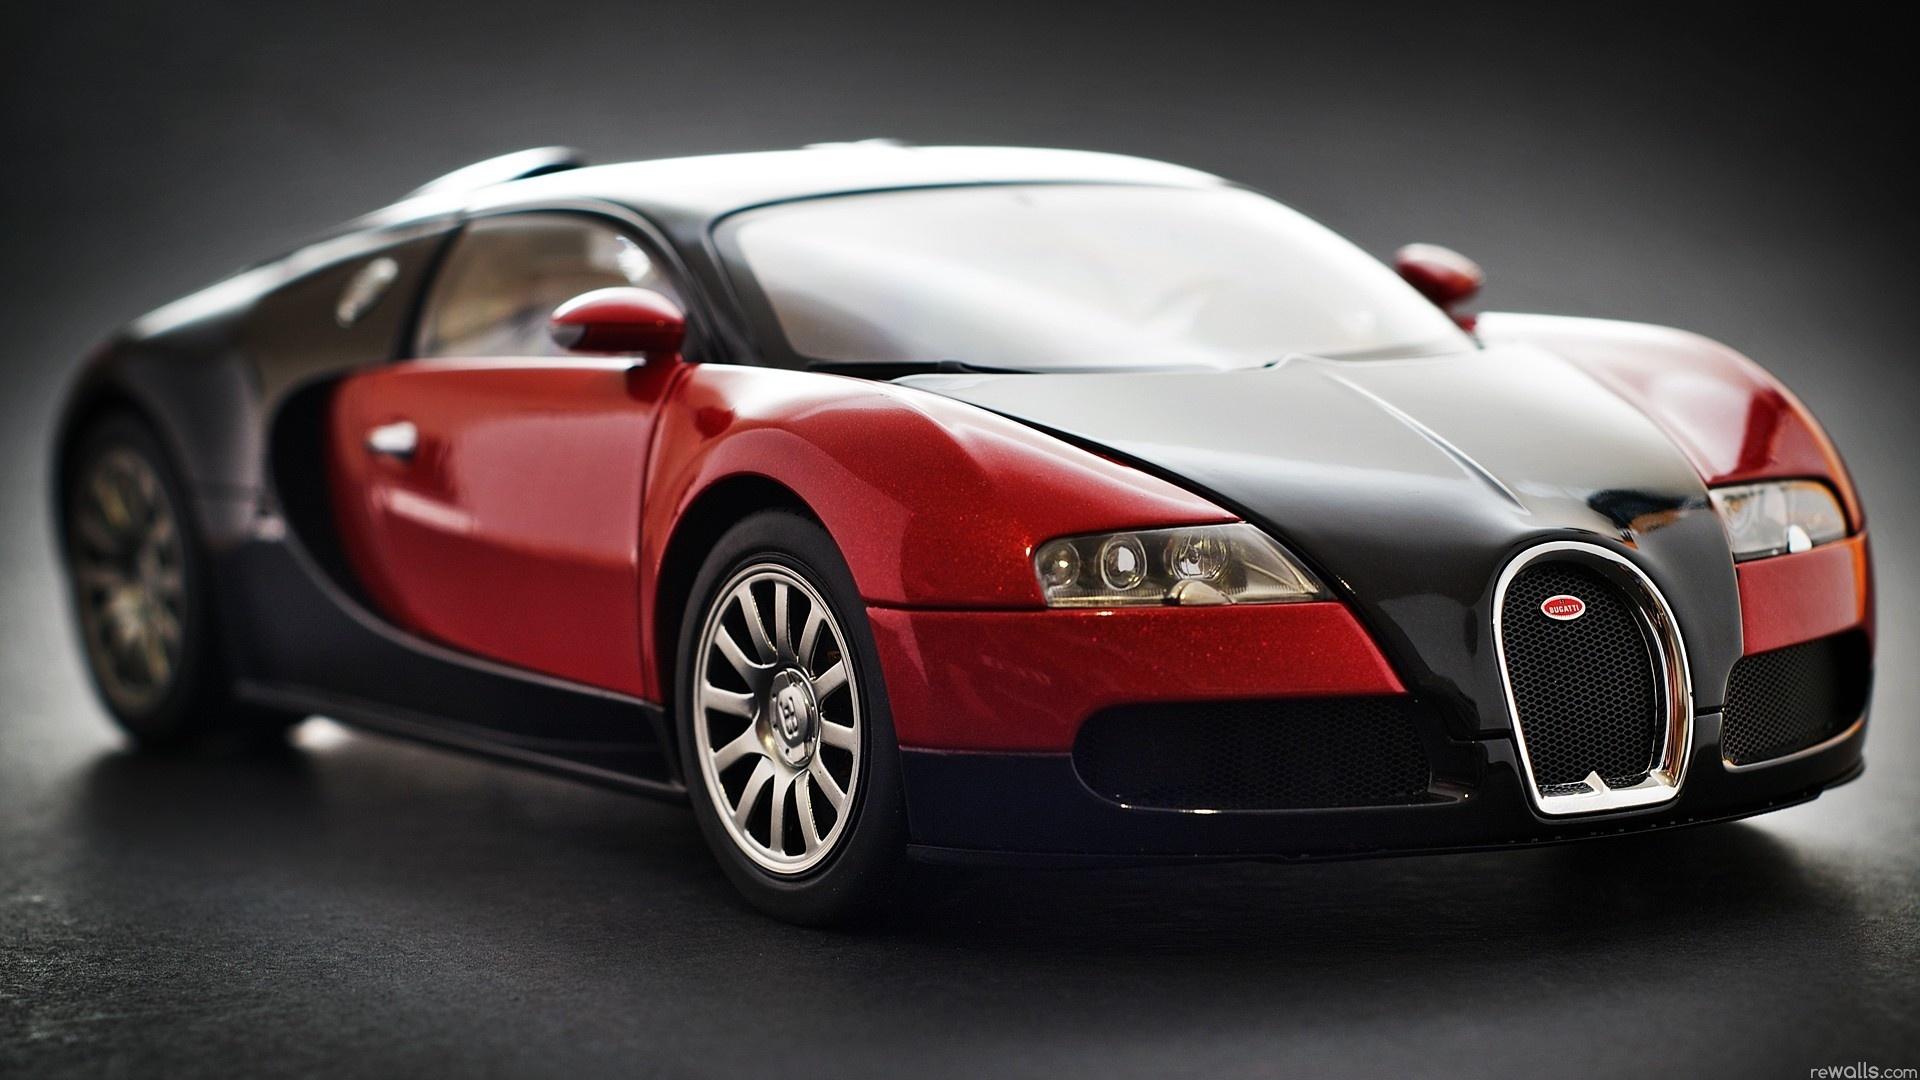 bugatti veyron wallpaper for desktop wallpapersafari. Black Bedroom Furniture Sets. Home Design Ideas